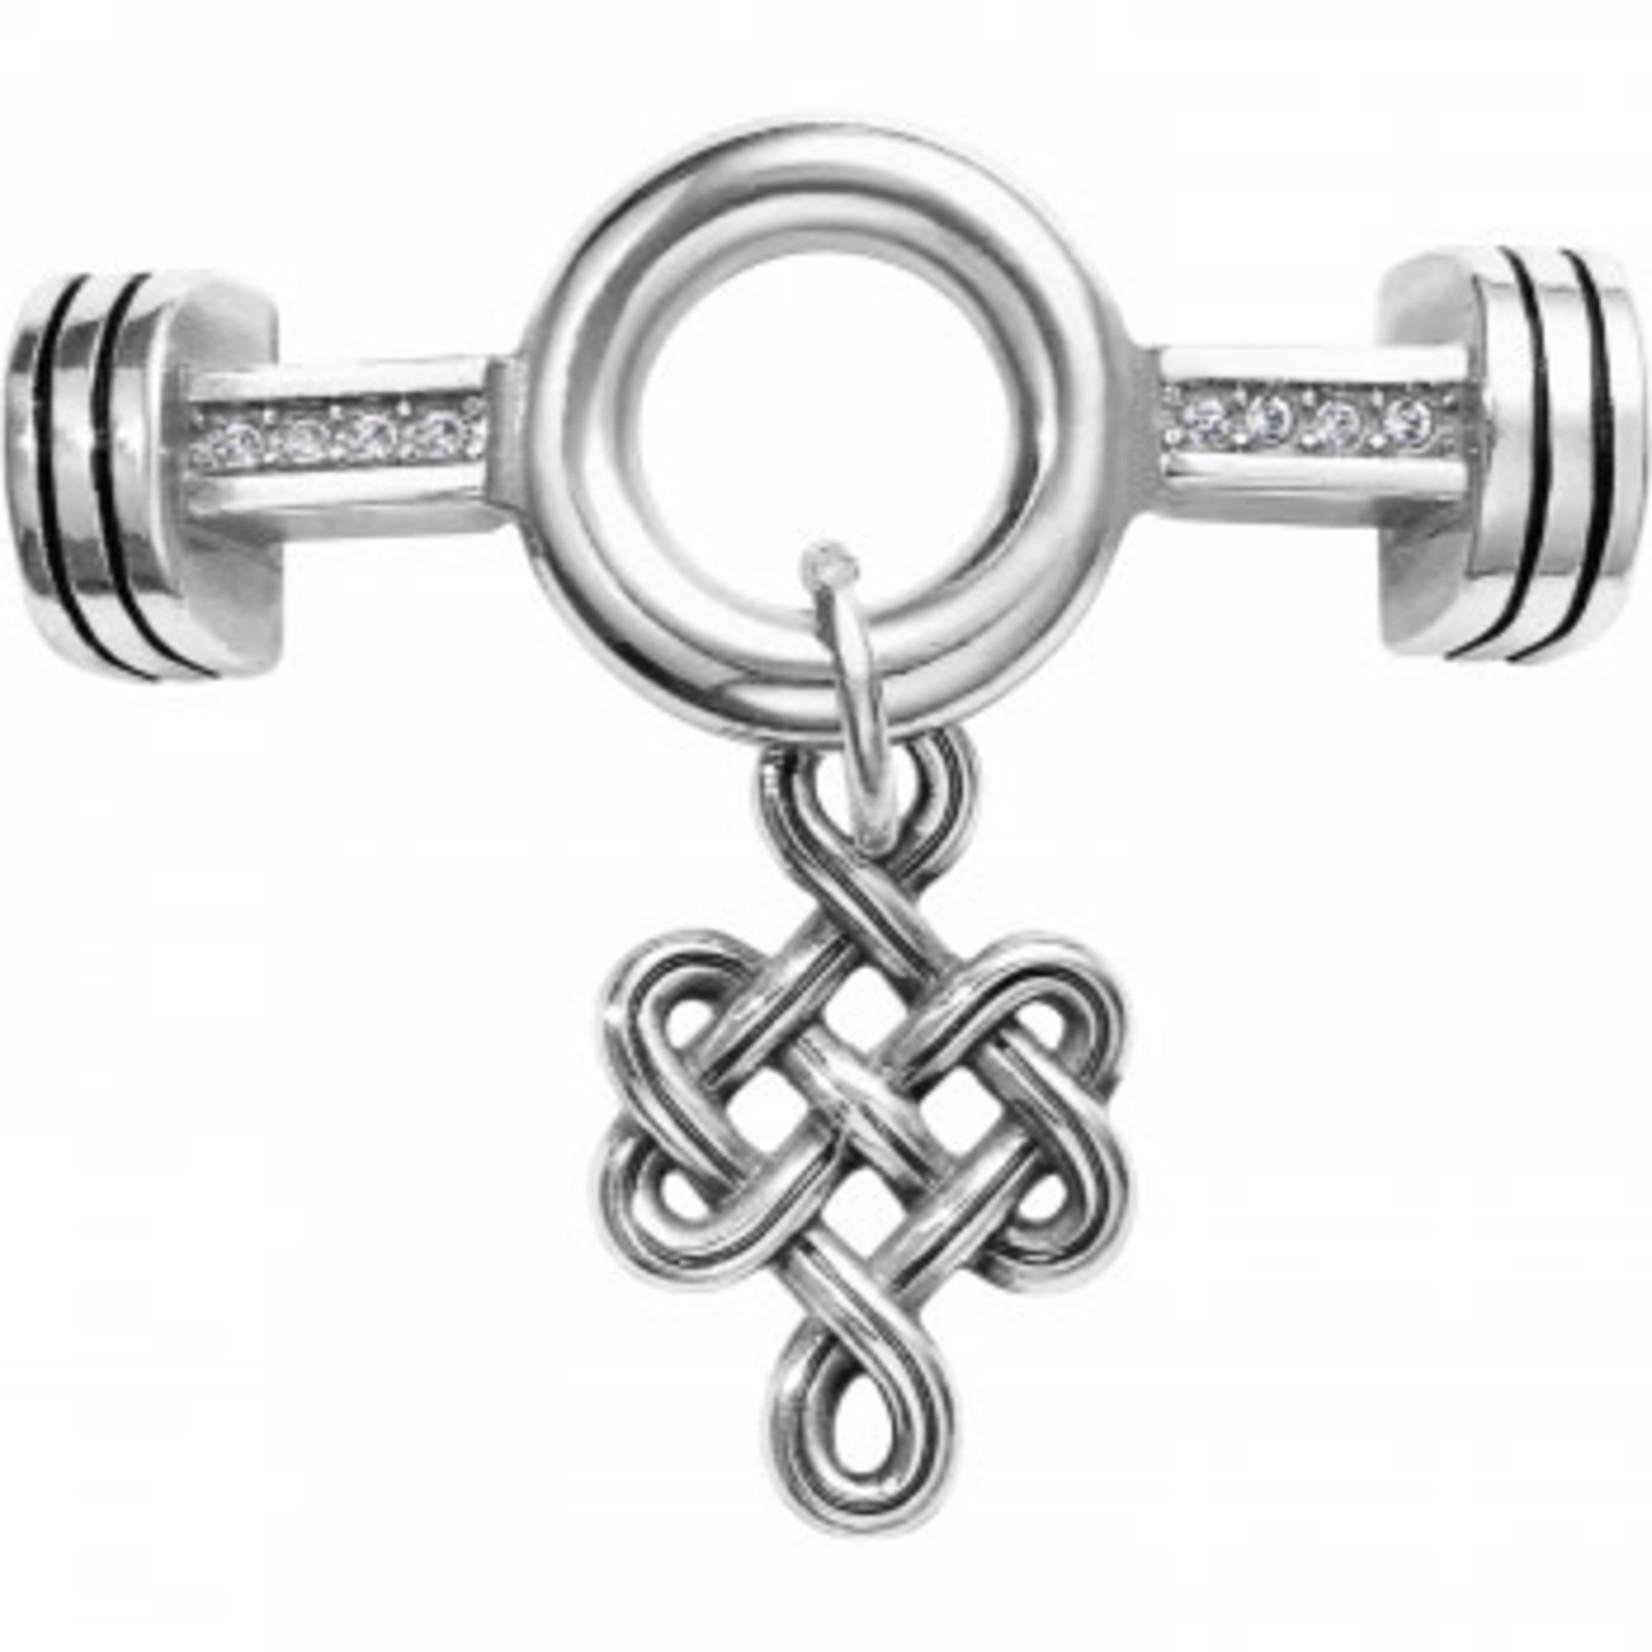 Brighton Color Clique Cord Endless Knot Ornament